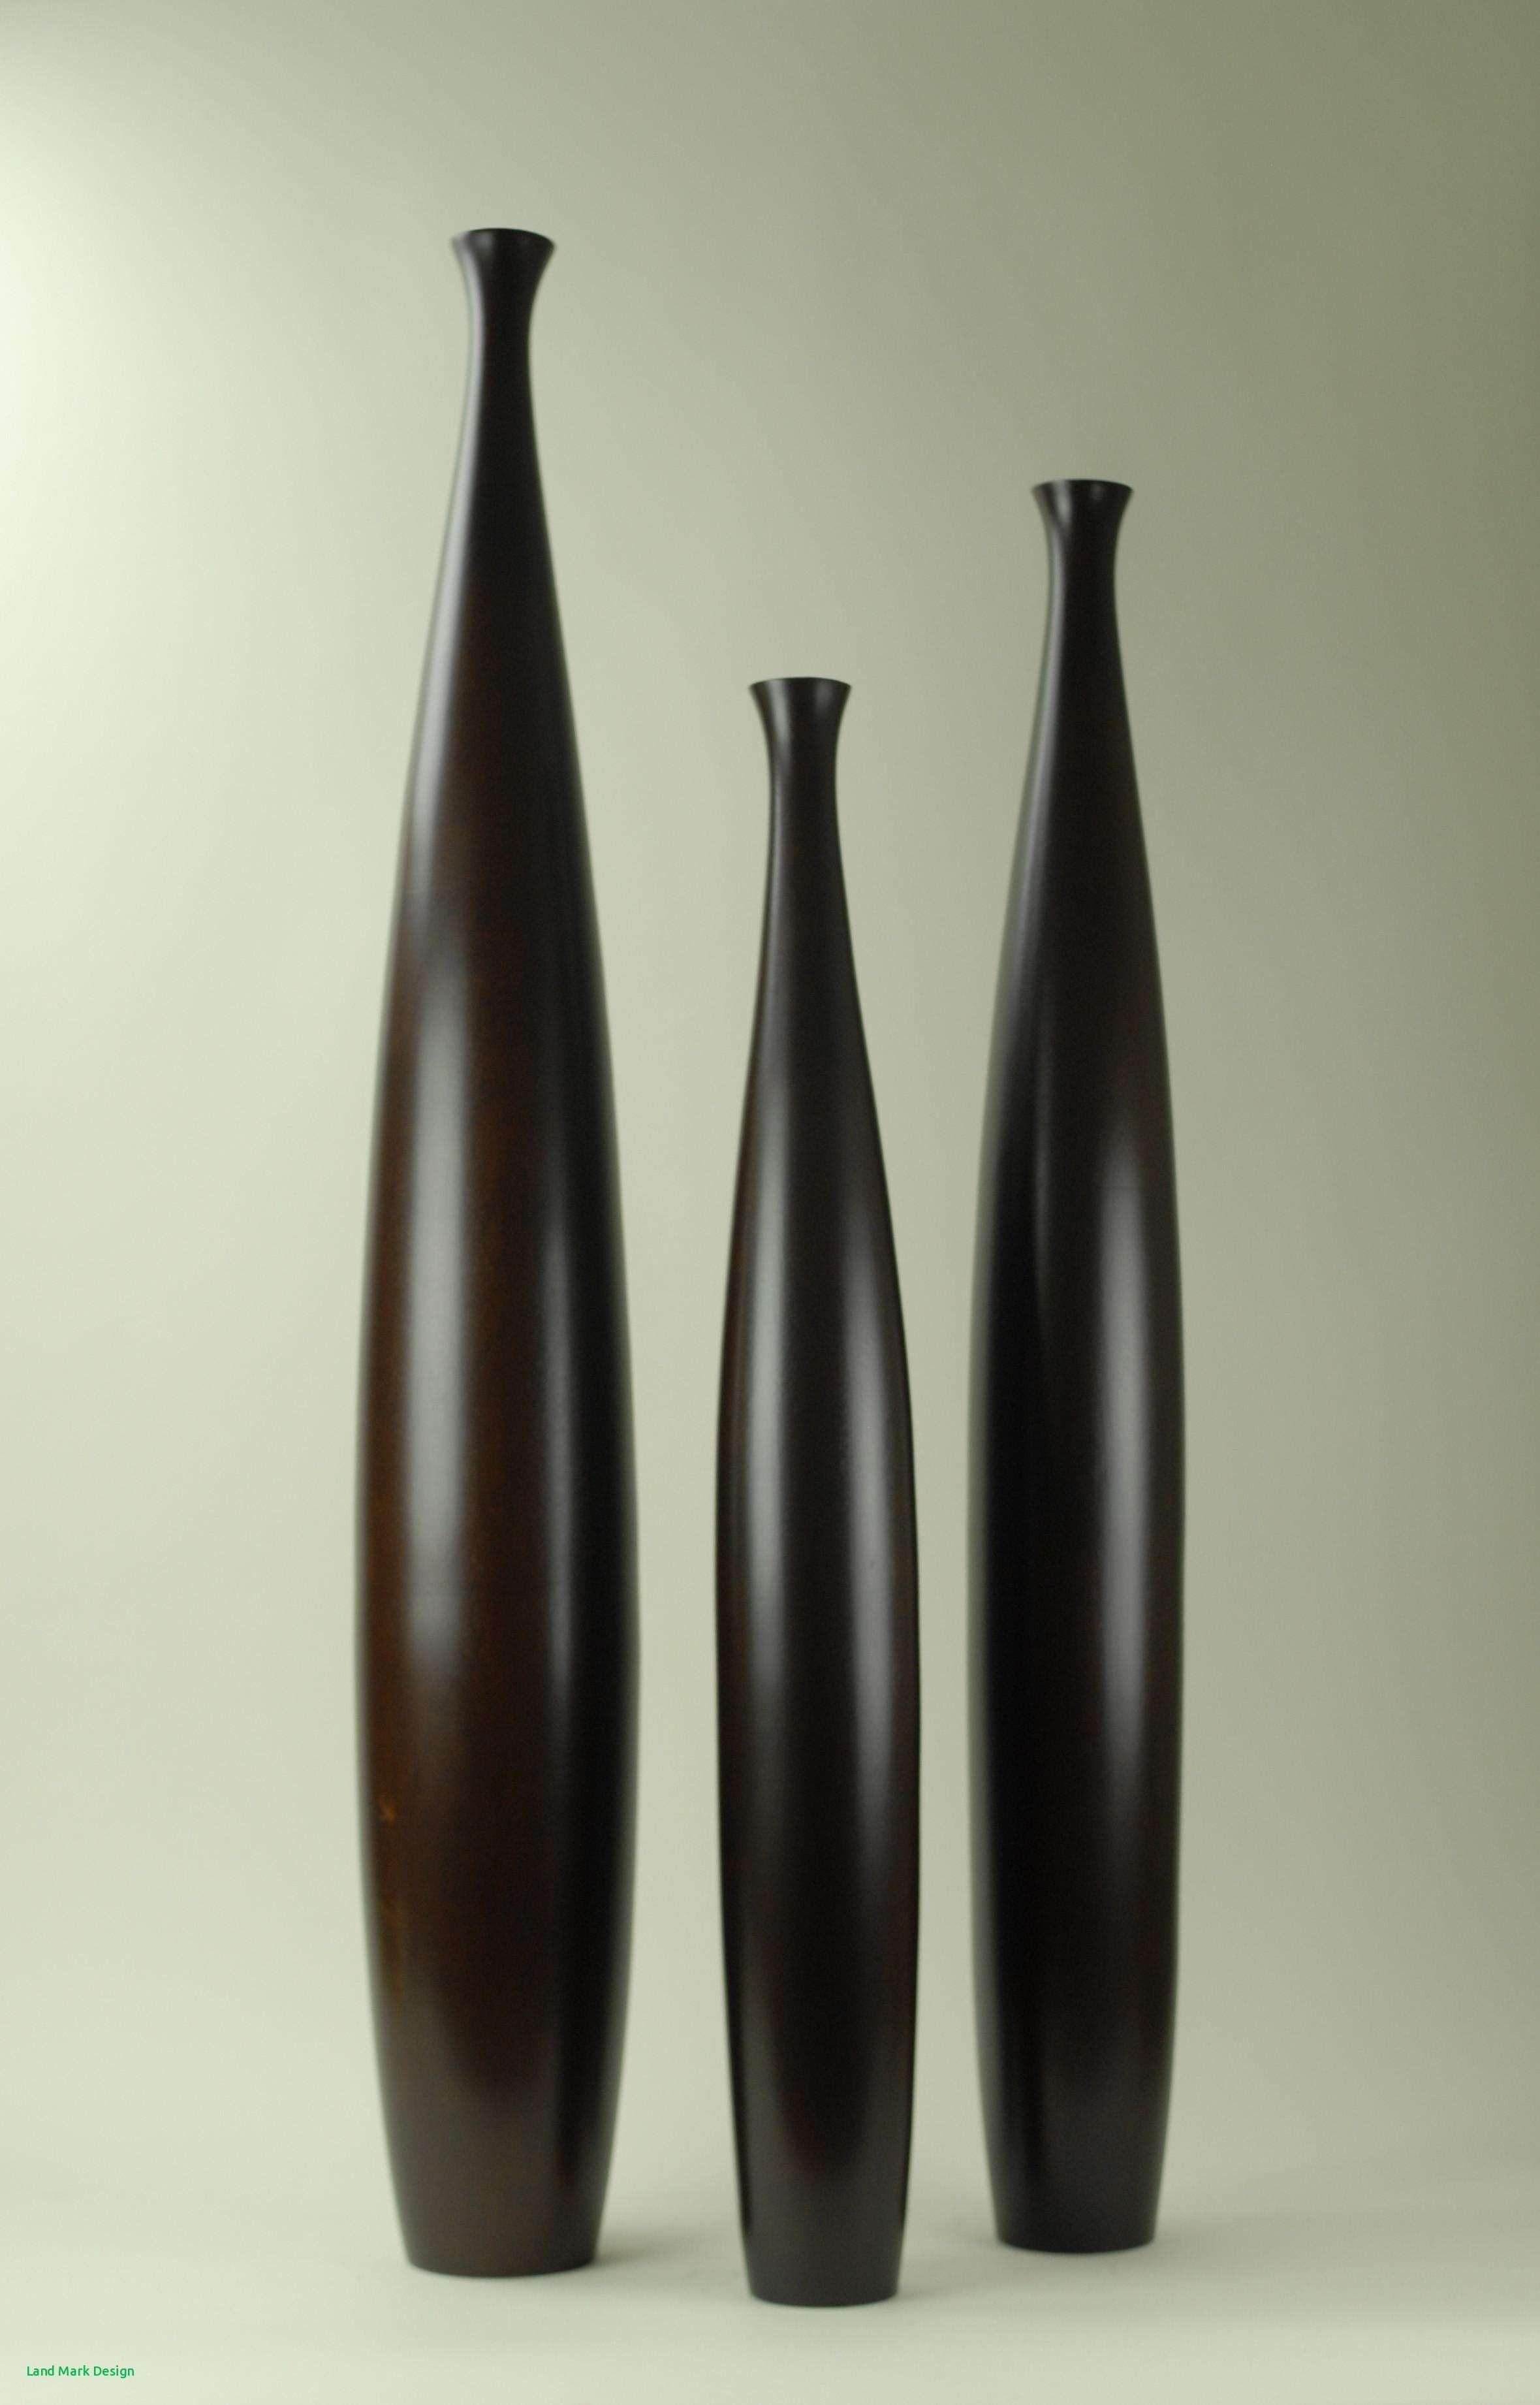 crystal floor vase of 30 large floor vase the weekly world with regard to white floor vase ceramic modern 40 inchl home design ikea inch